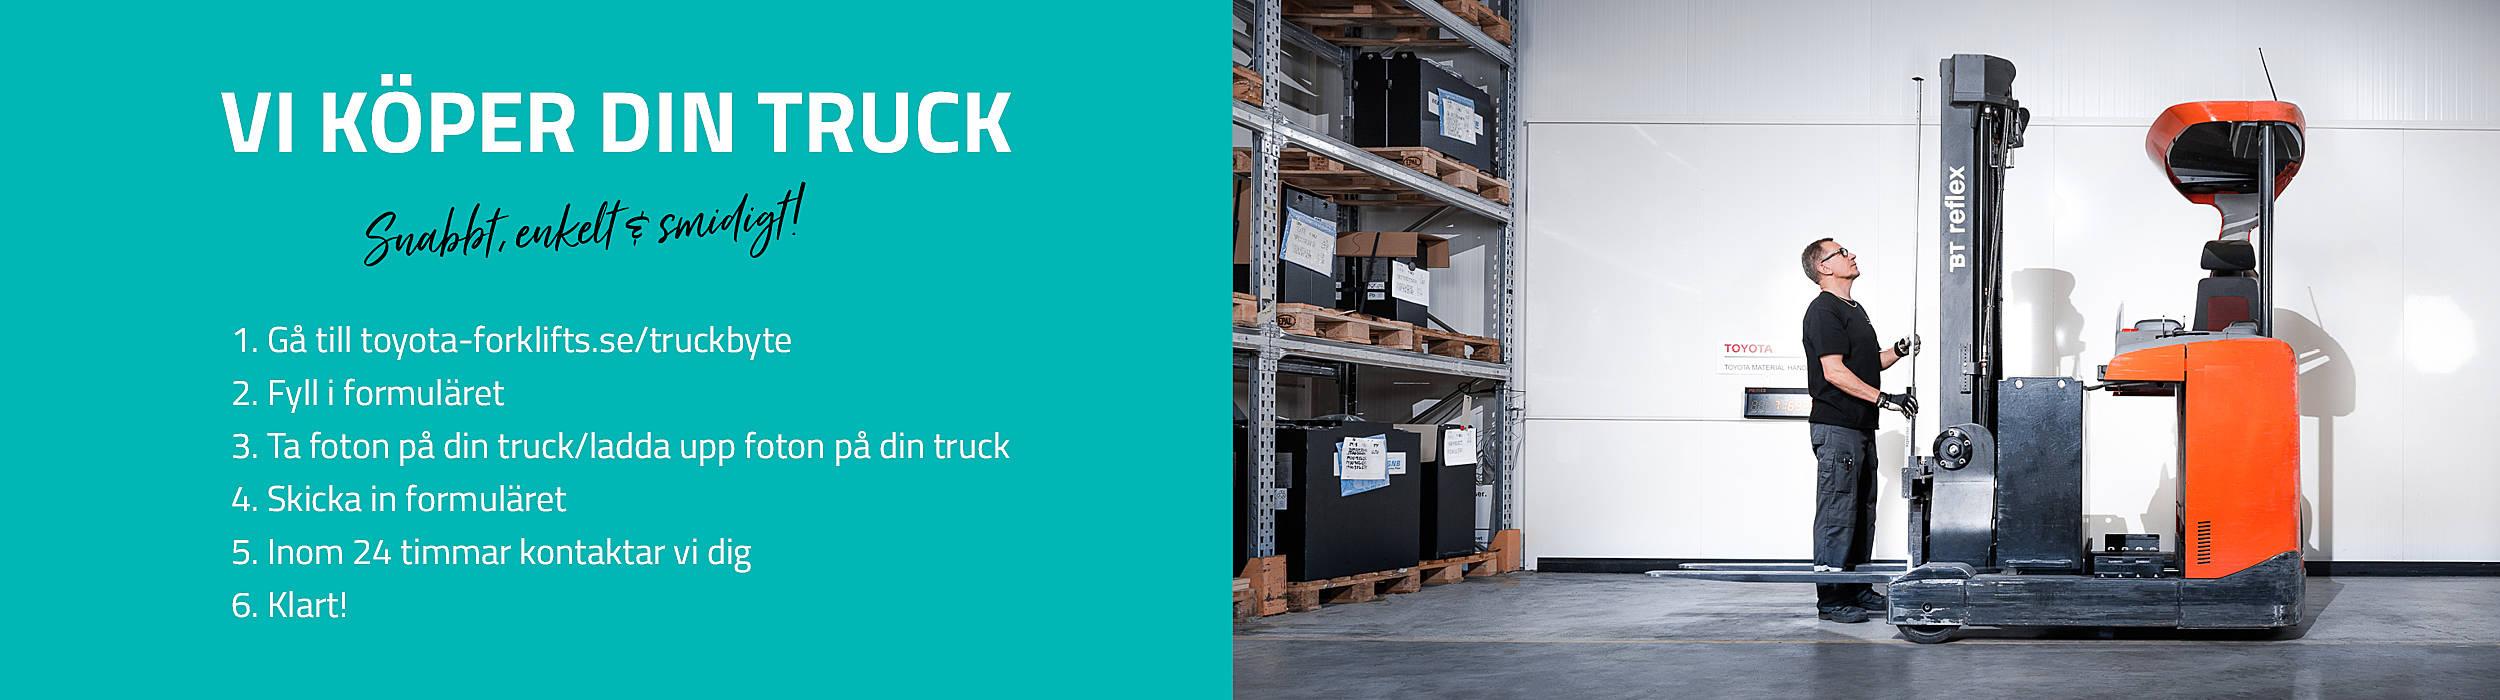 Vi köper din truck. Gå in på: Toyota-forklifts.se/truckbyte